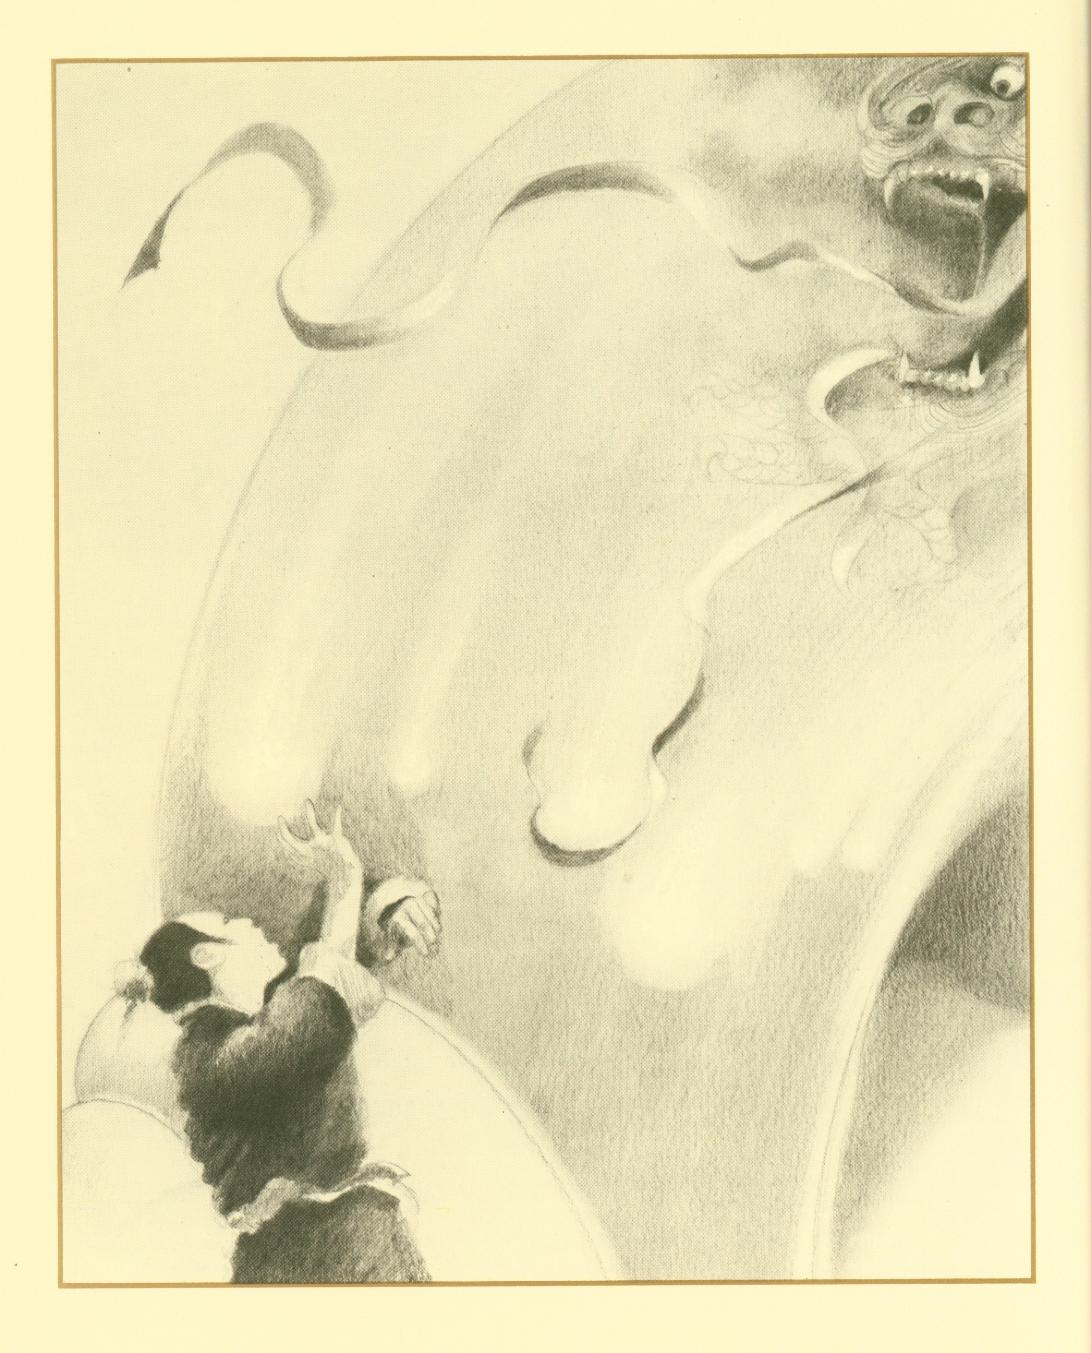 White Wave, pg. 20